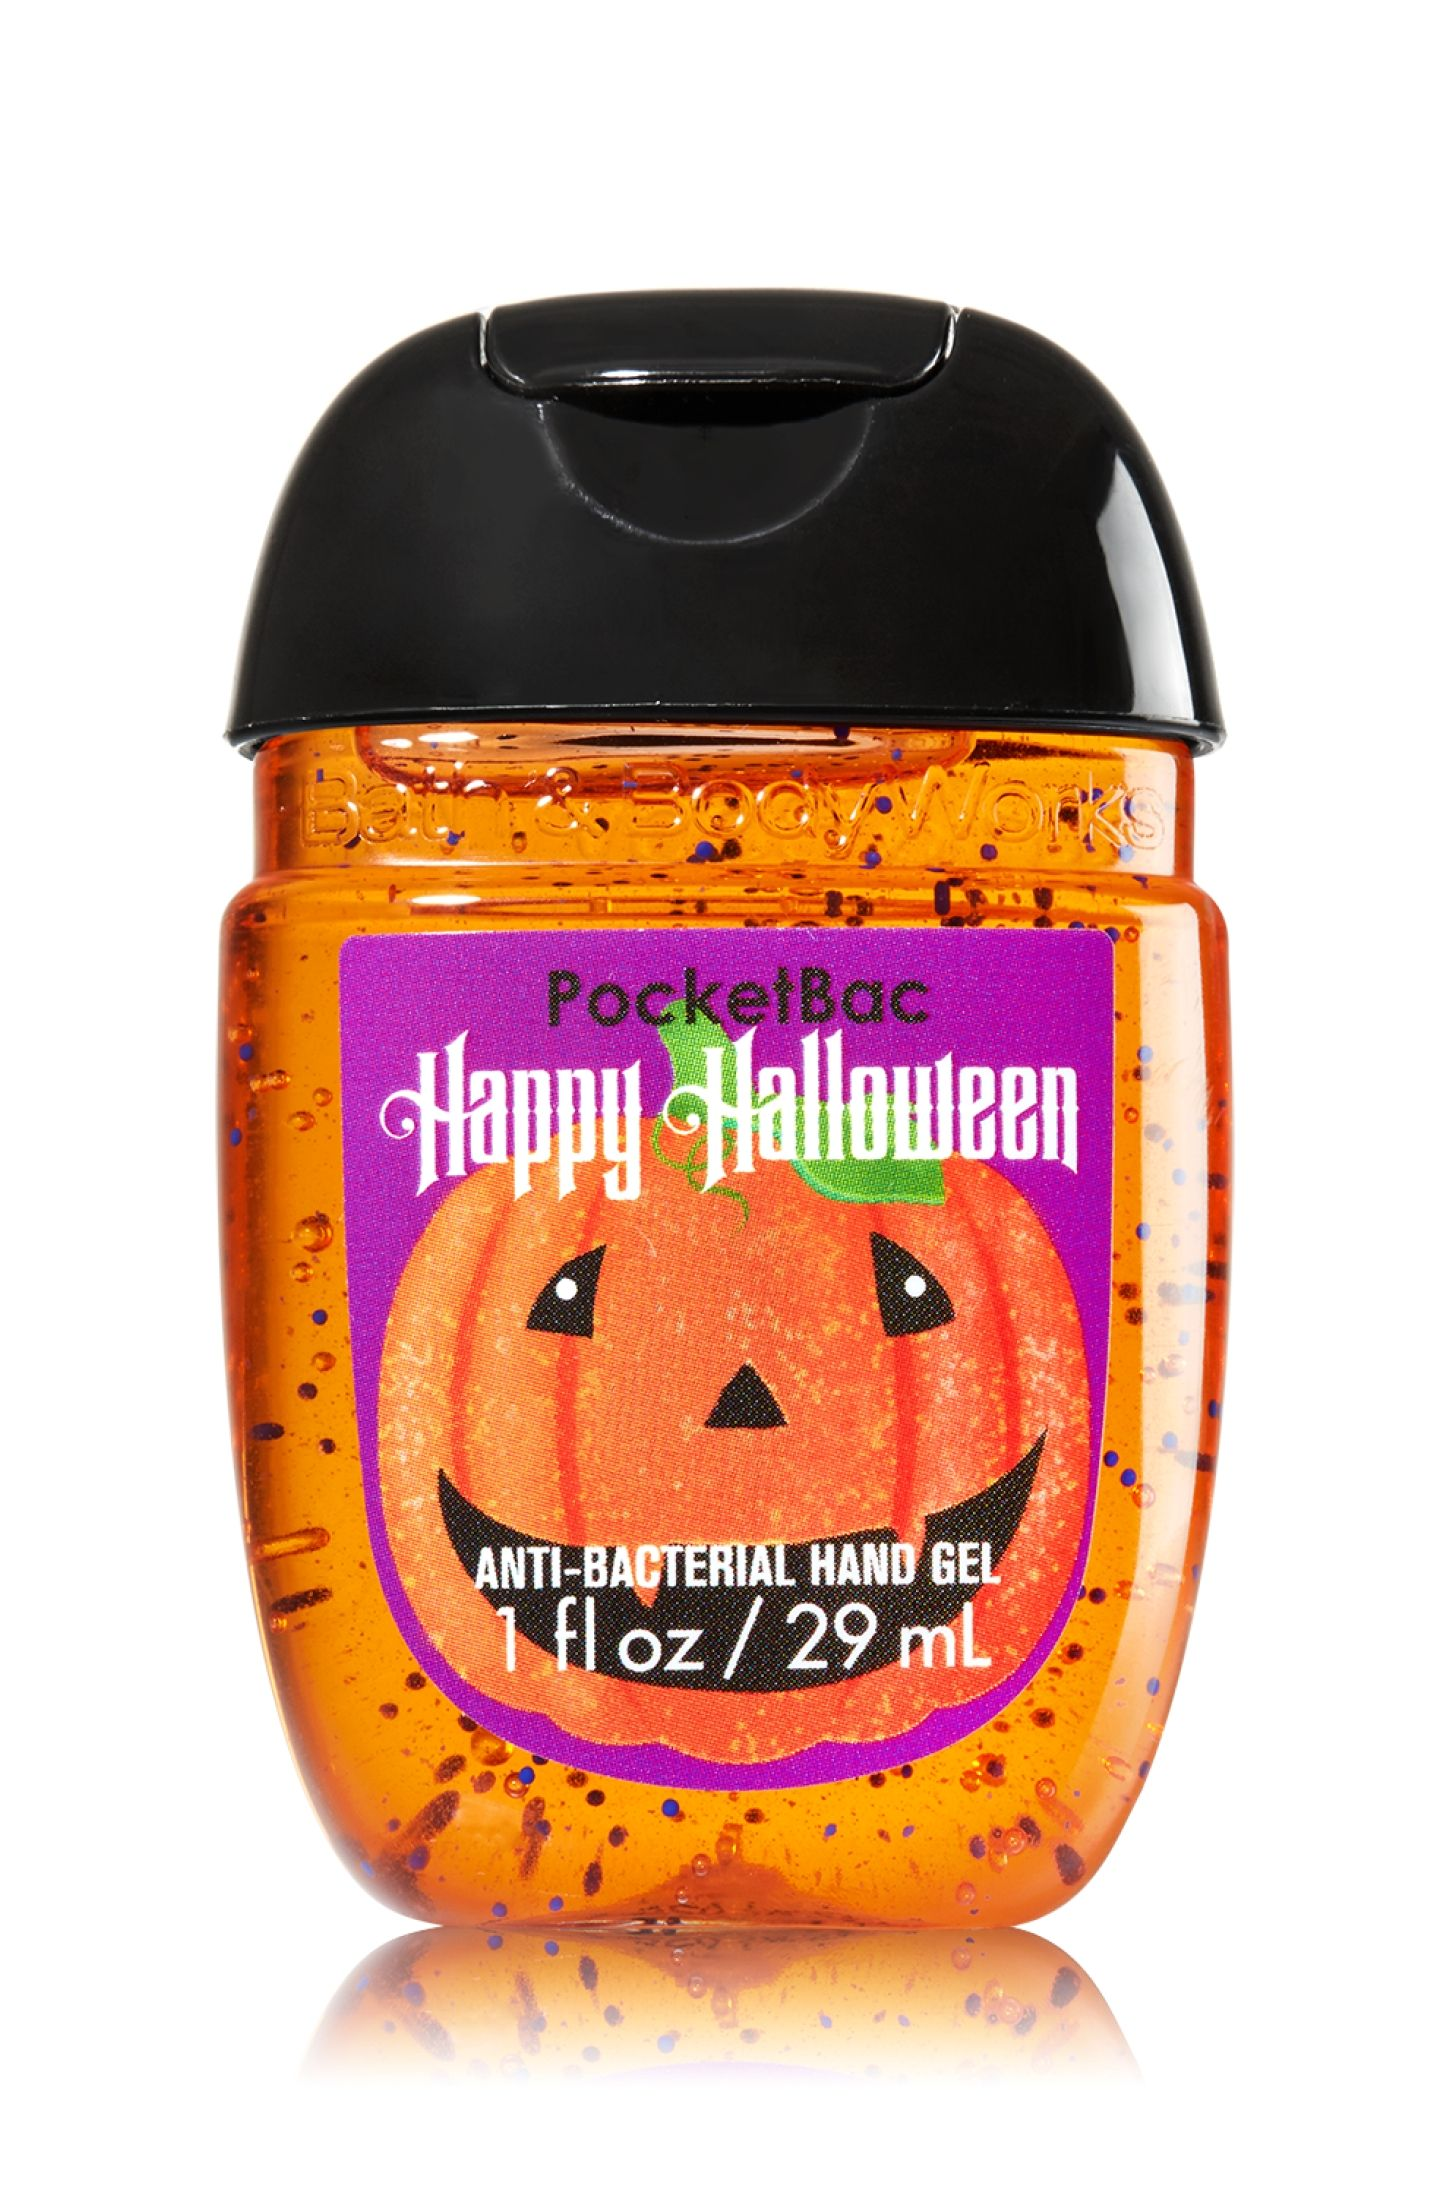 Happy Halloween Pocketbac Sanitizing Hand Gel Soap Sanitizer